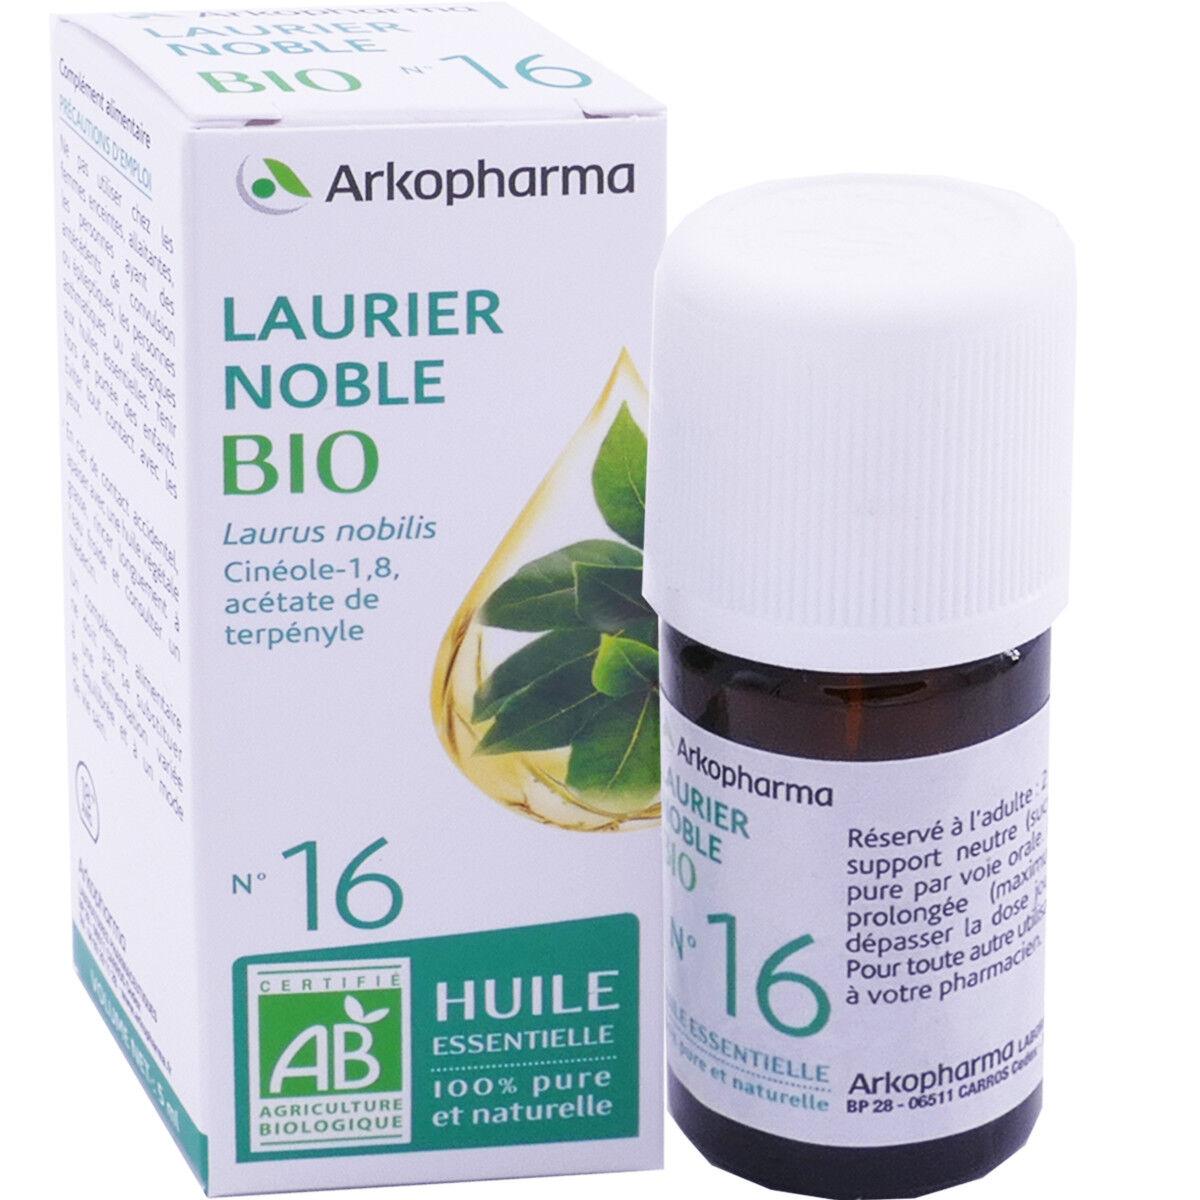 Arkopharma huile essentielle laurier noble bio n°16 5 ml